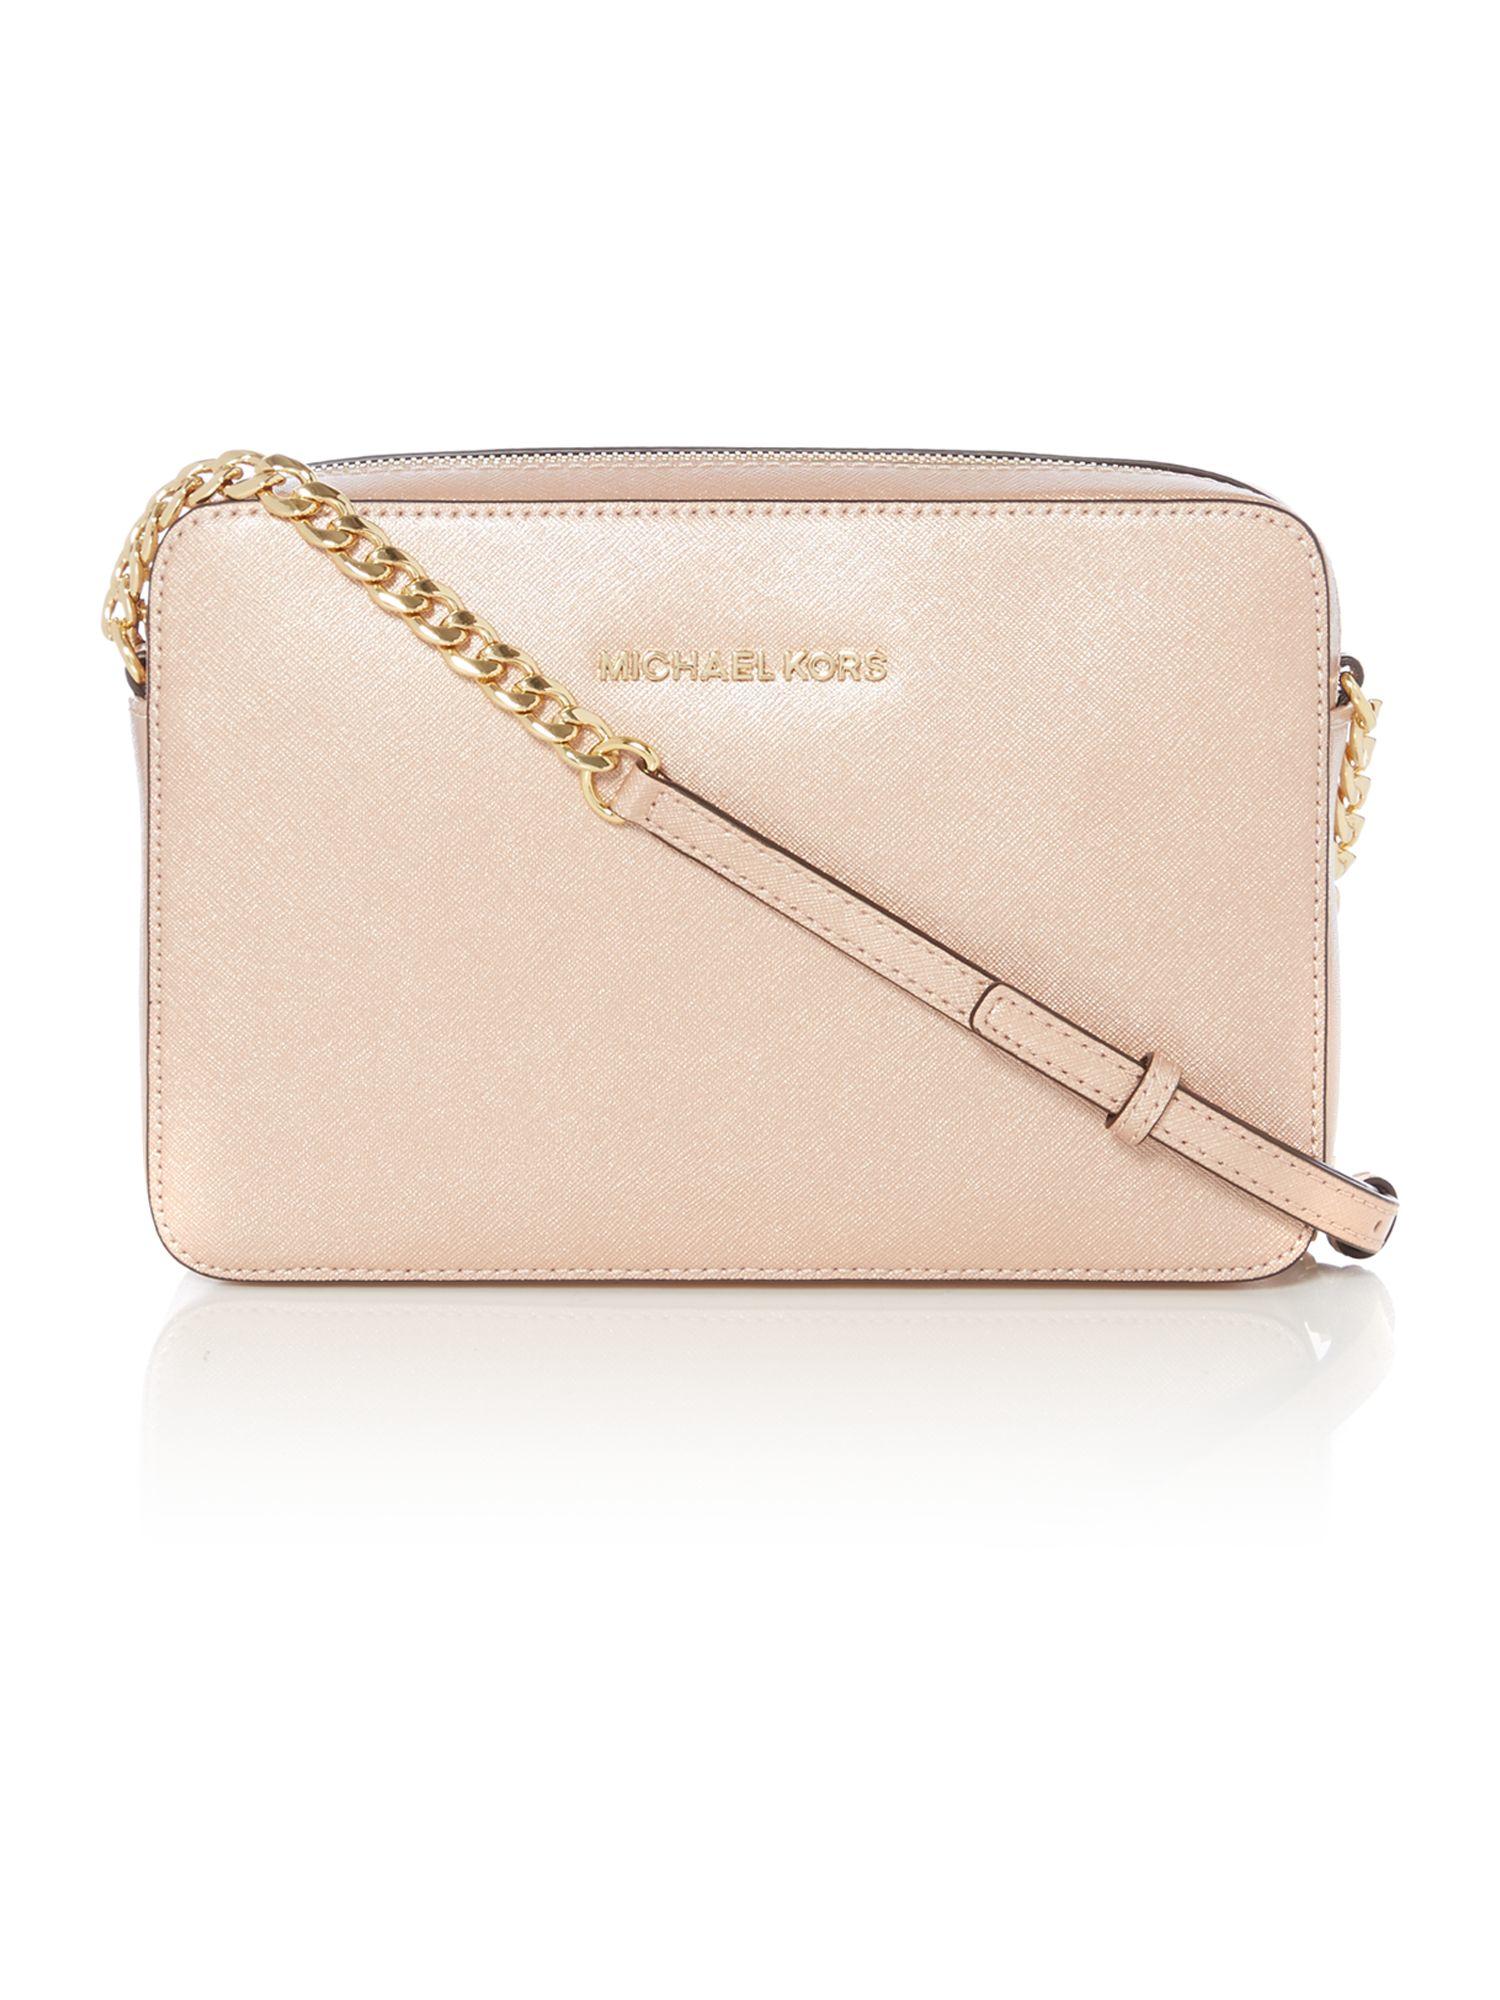 e63229a71add Michael Kors Jetset Travel Pink Metallic Crossbody Bag in Pink - Lyst